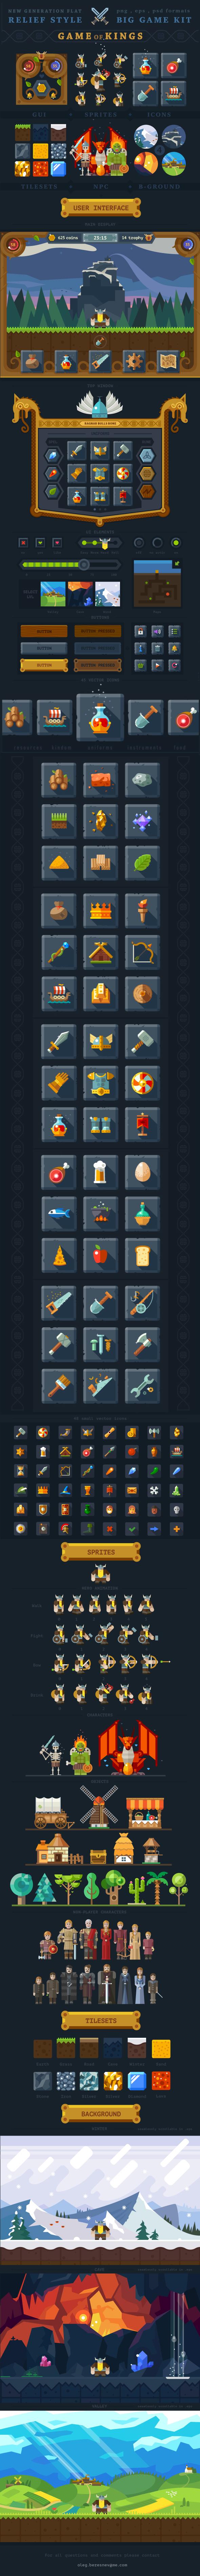 icons flat UI game resources uniform War app Weapon knight cartoon Magic   Armor monster rpg